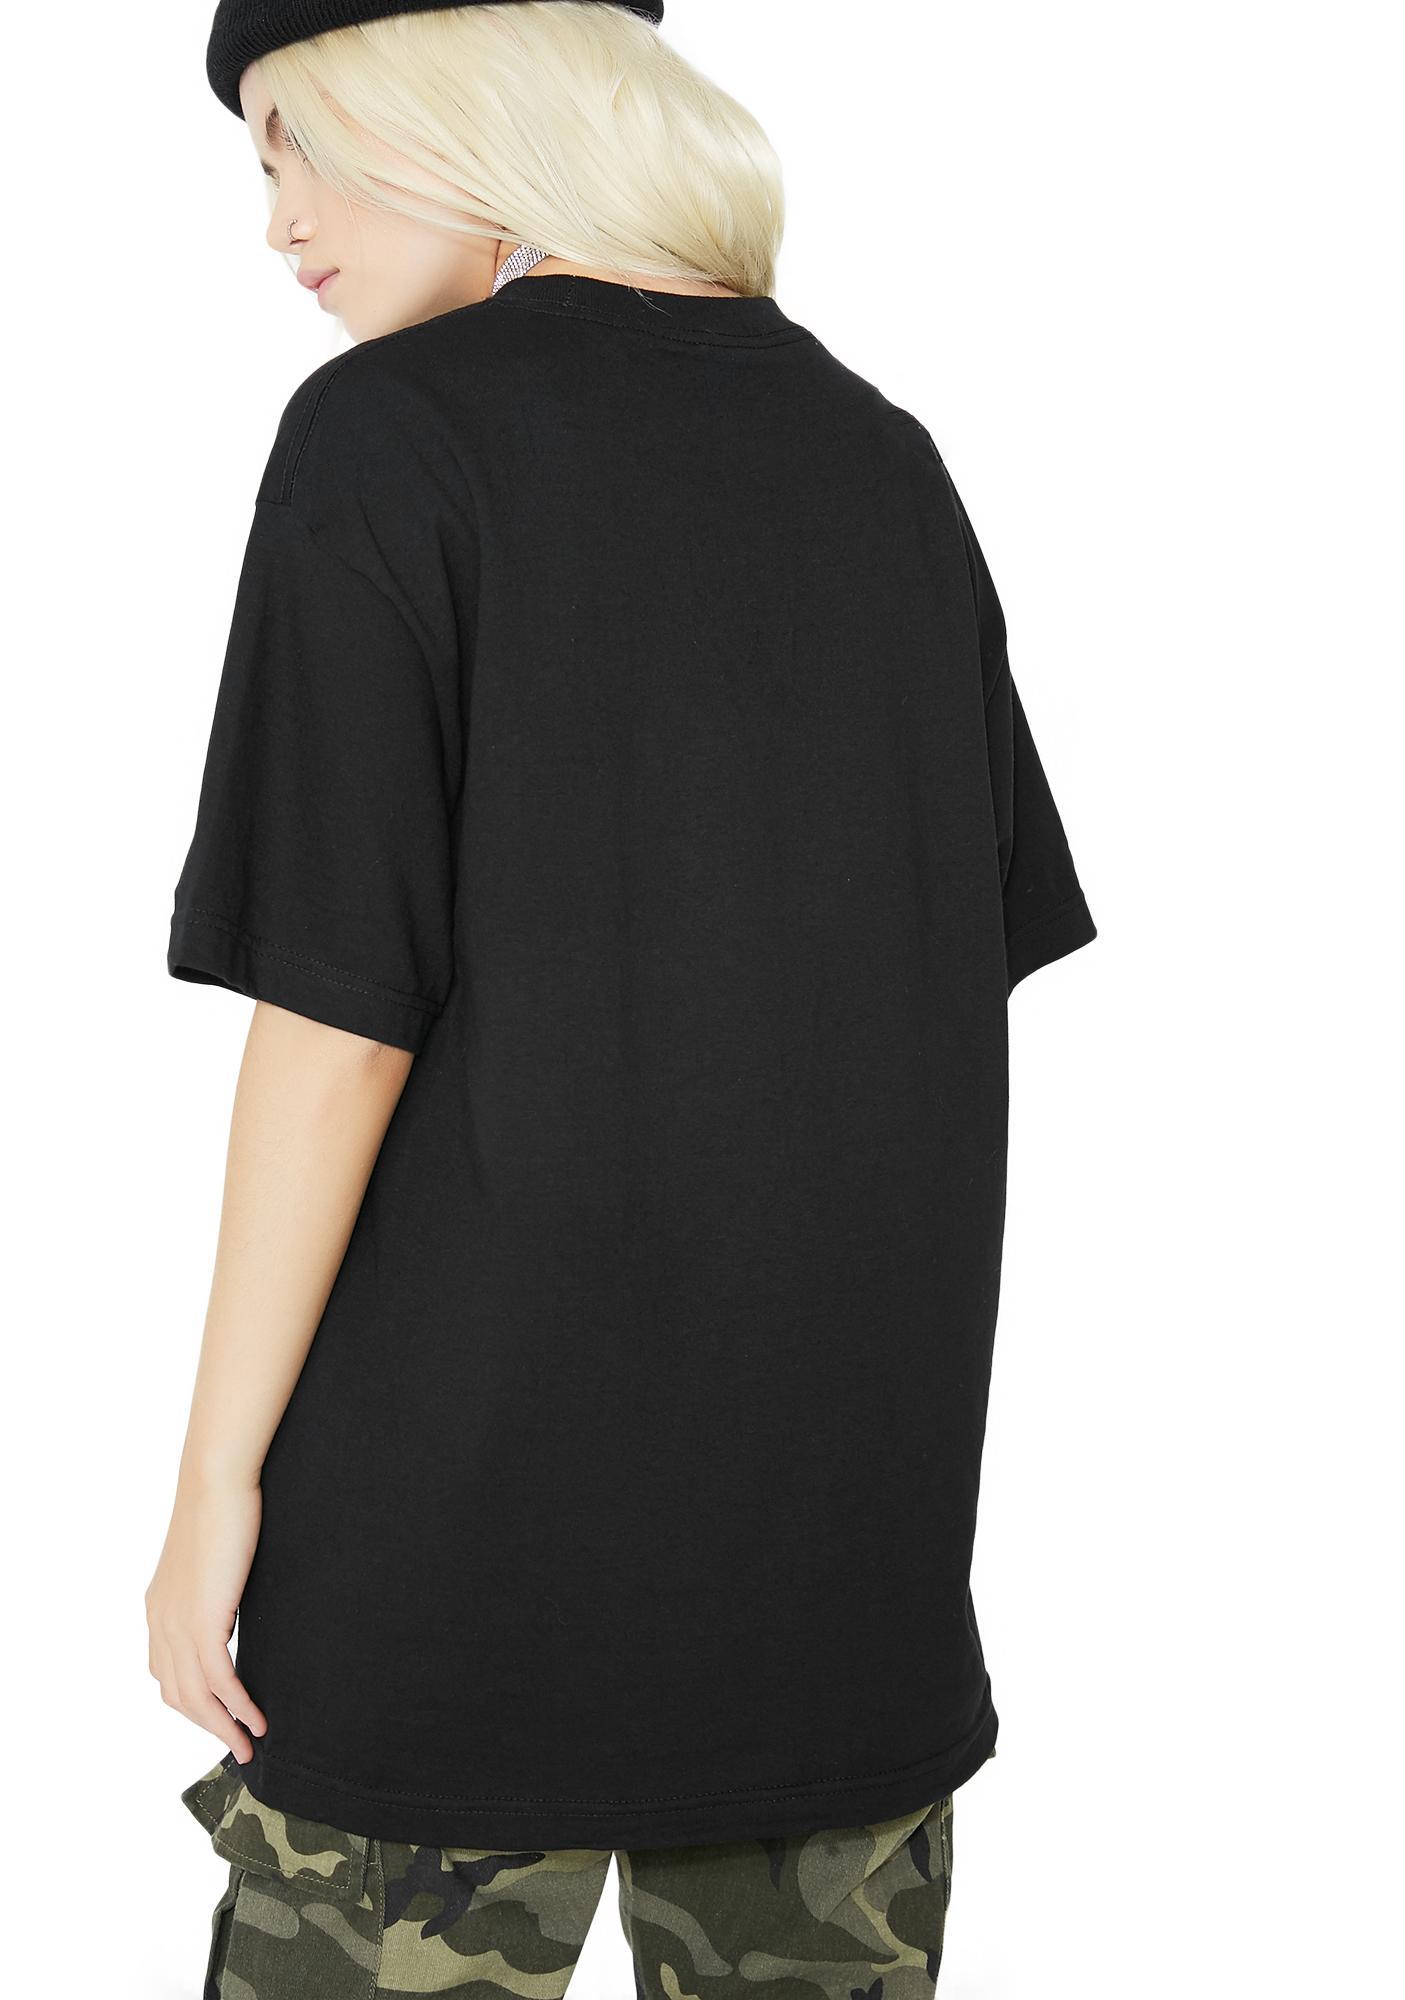 Mishka Disbelieve T-Shirt